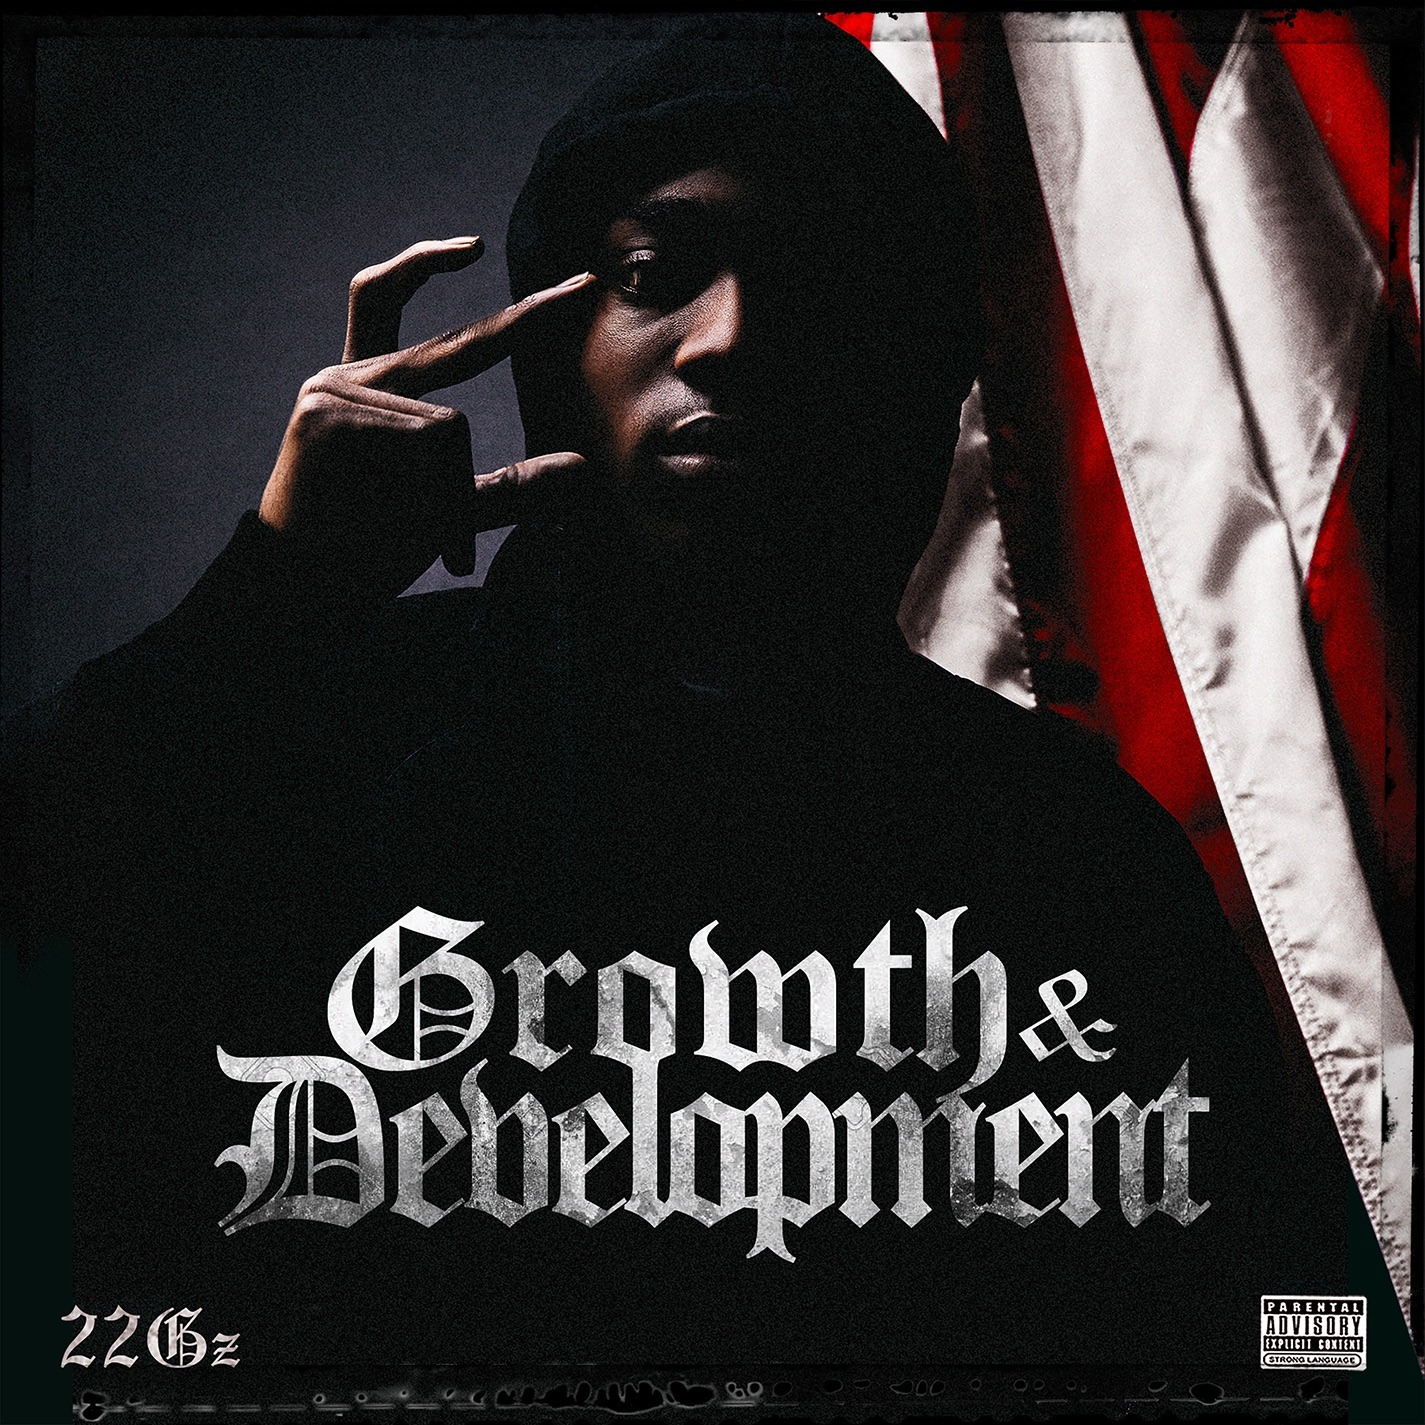 22Gz – Growth & Development